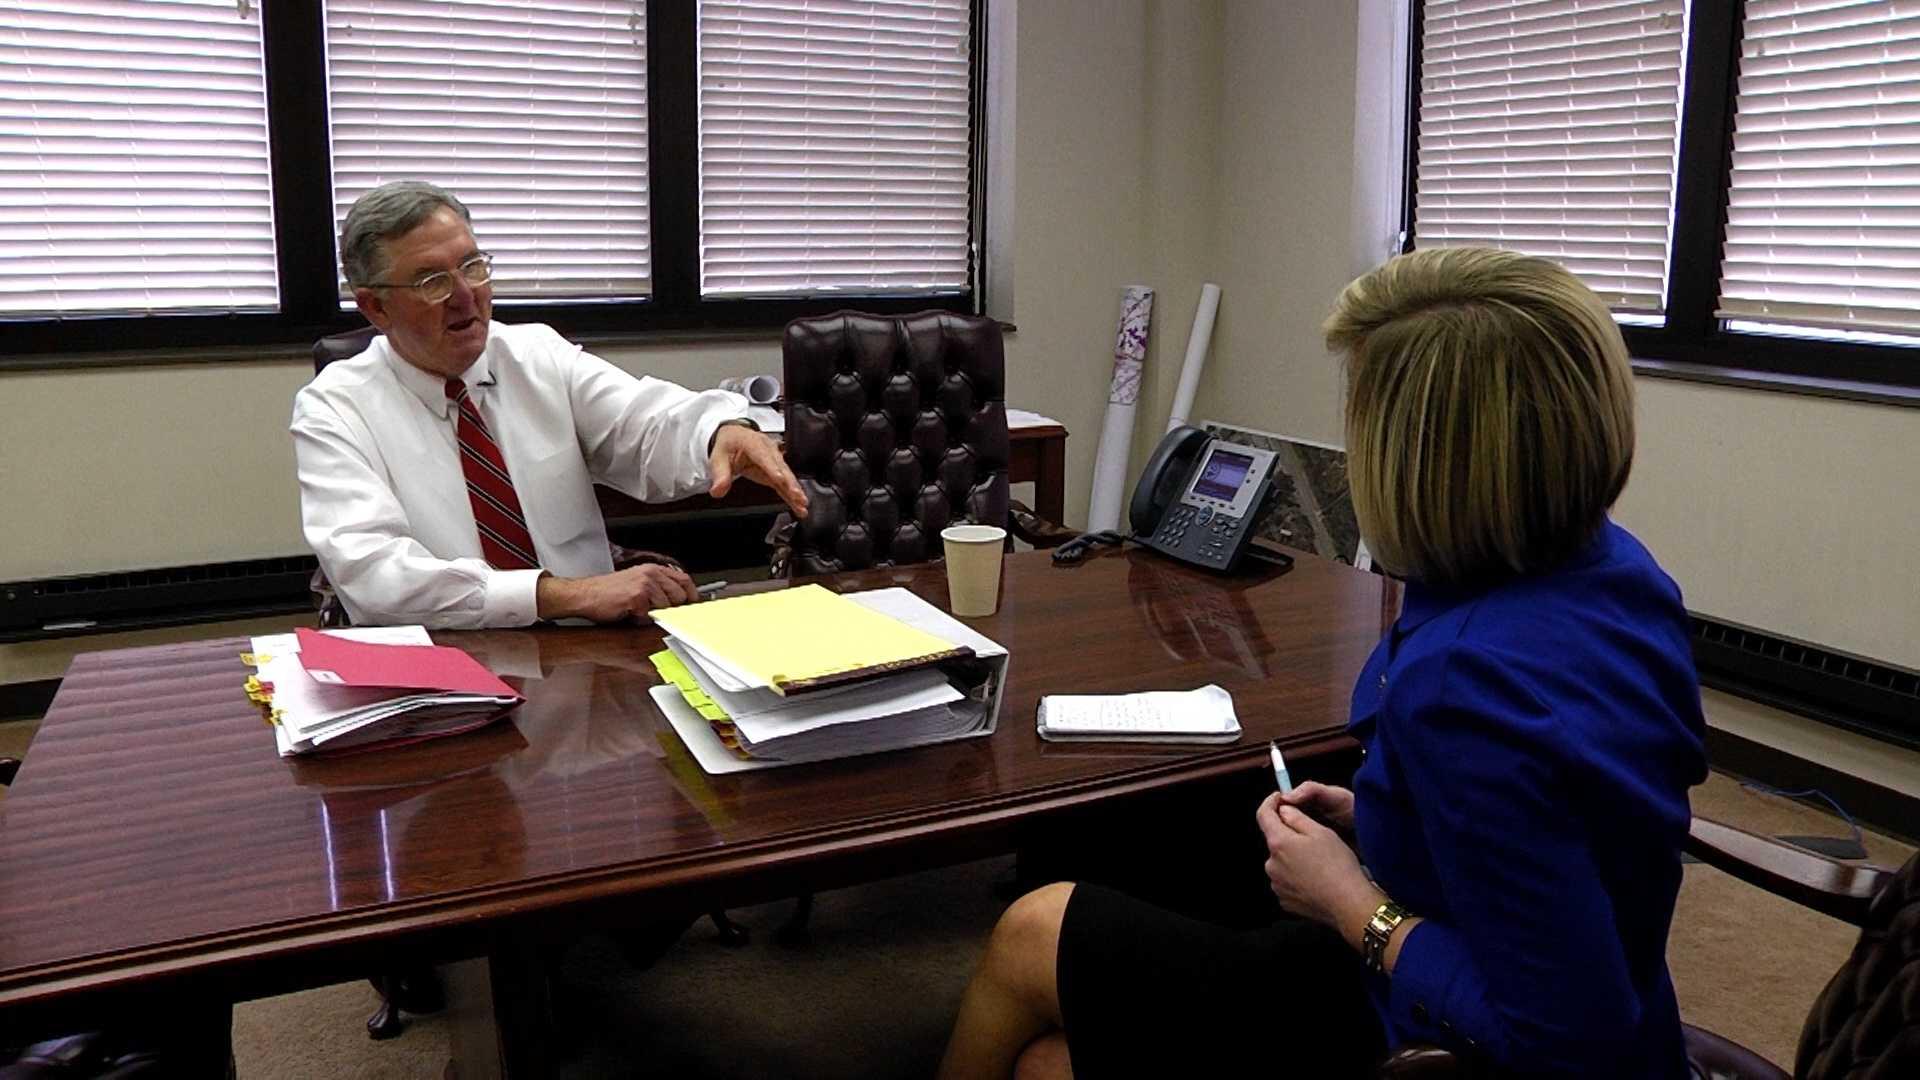 Jefferson County Schools Superintendent Craig Pouncey